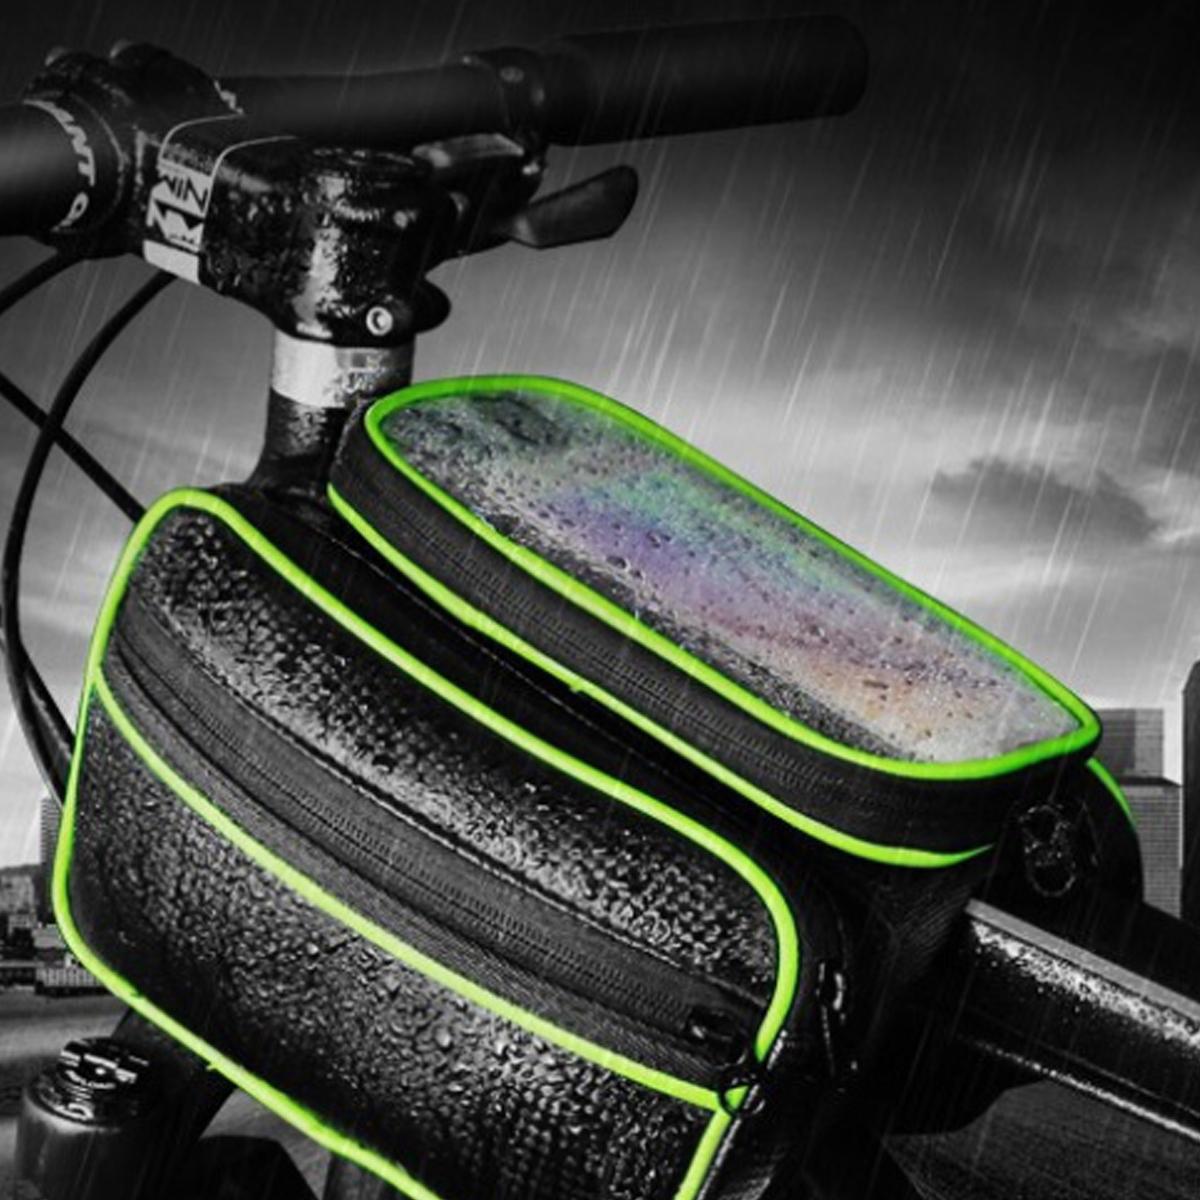 BIKIGHTBiciperbiciclettaanterioretelaio tubo Phone Borsa Touch Screen impermeabile doppio sacchetto ciclismo Borsa